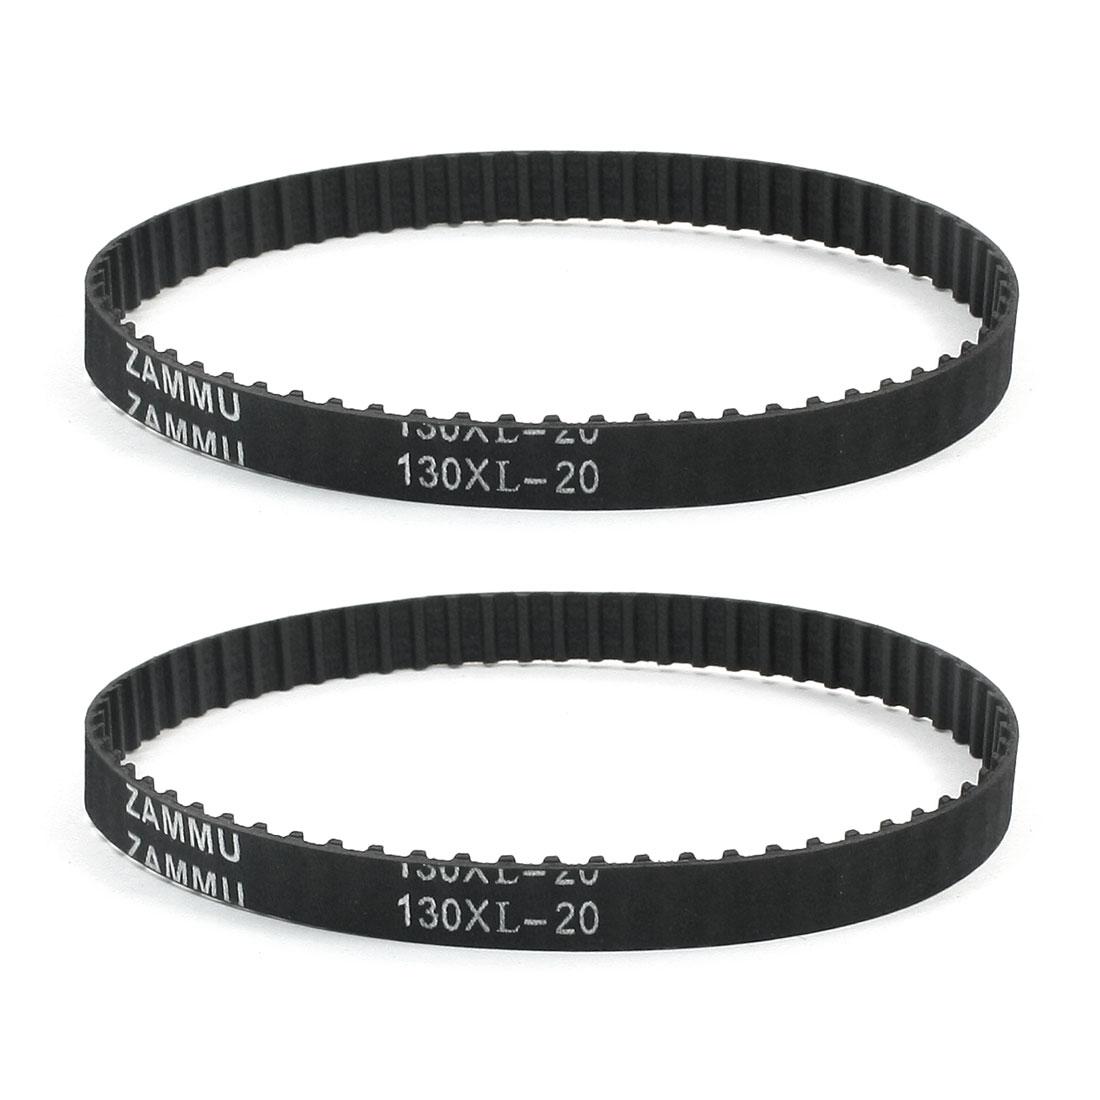 "130XL 13"" Girth 5.08mm Pitch 65-Teeth Black Rubber Industrial Synchro Machine Synchronous Timing Belt 2Pcs"